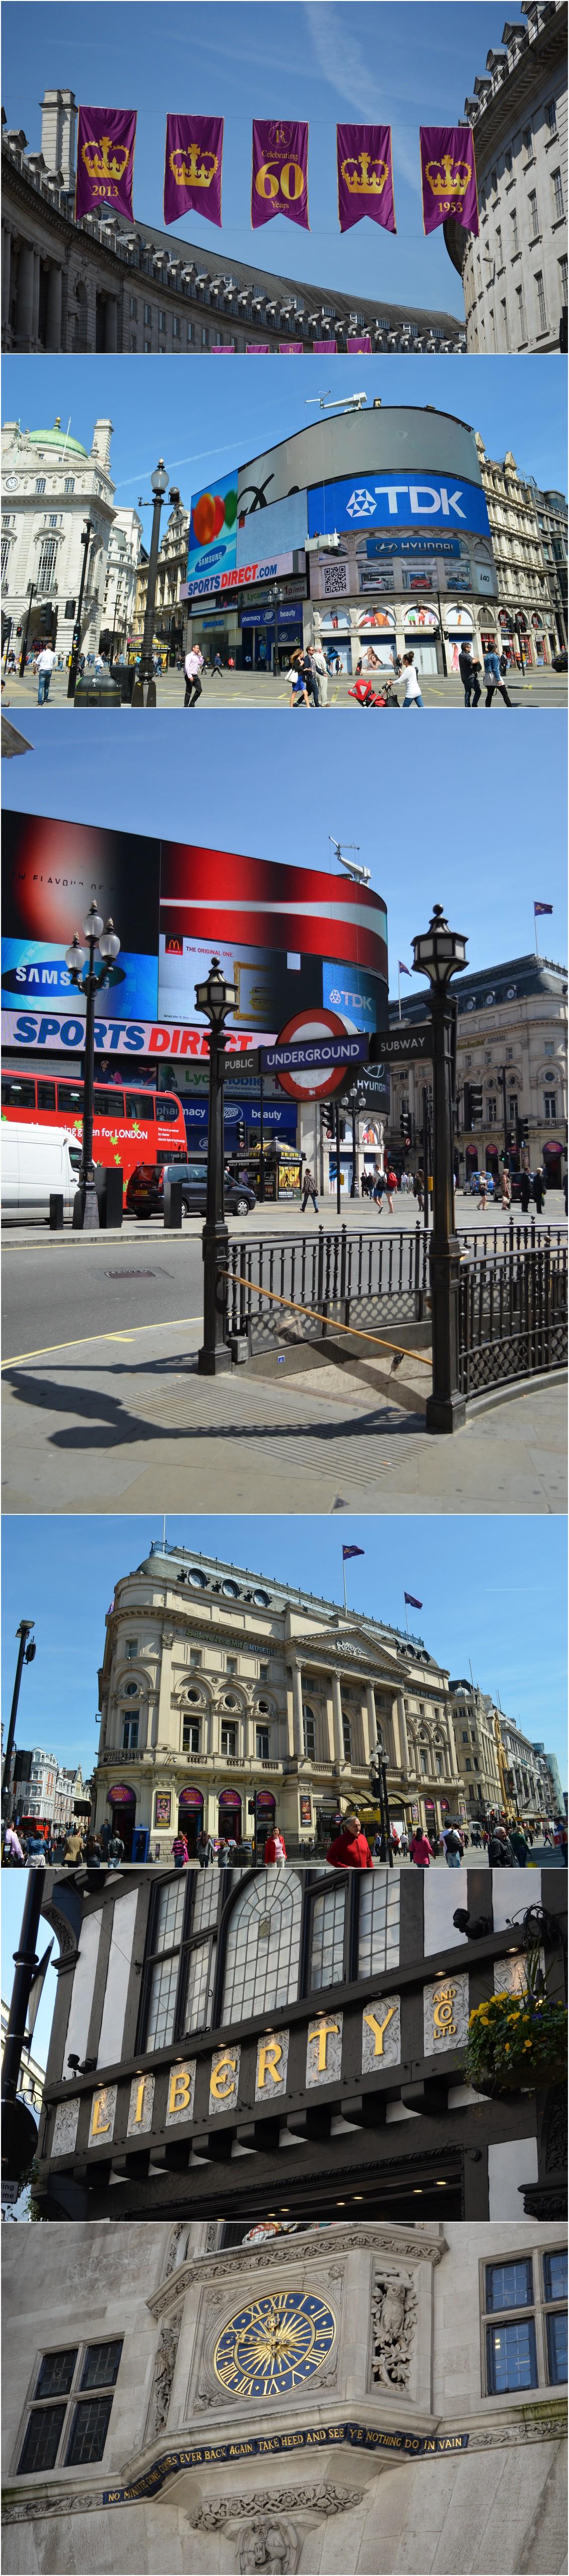 Londres Montage 2